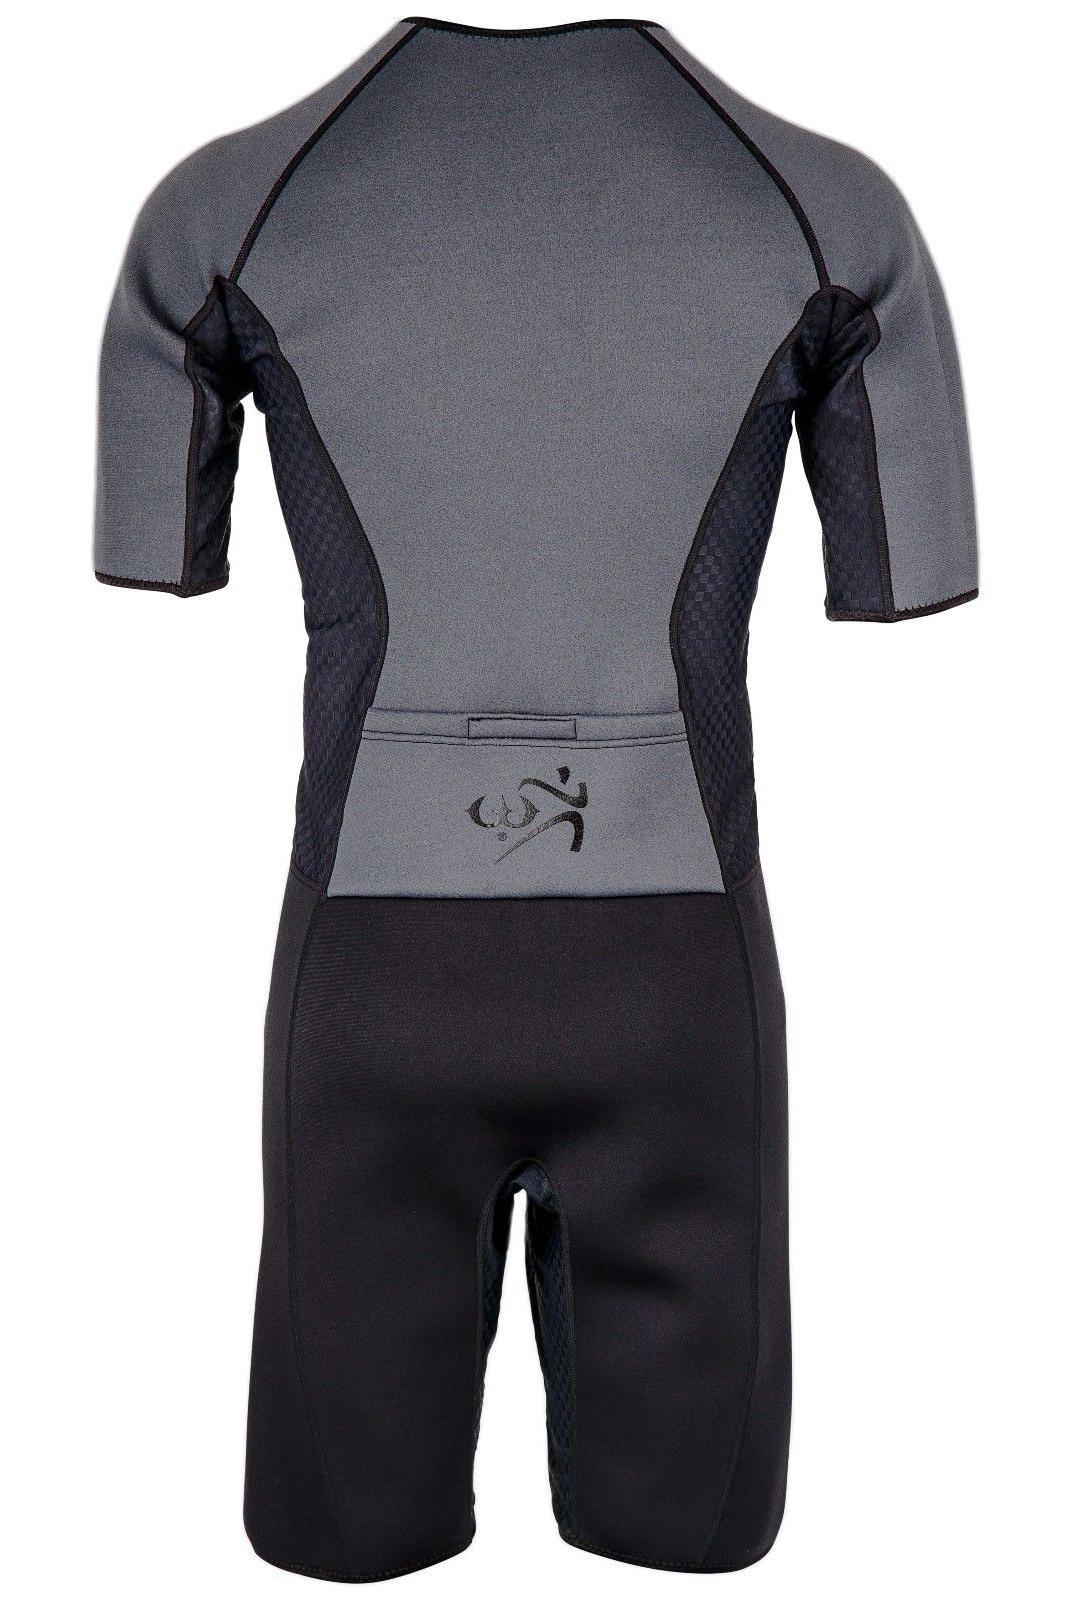 Kutting Loss Men's Suit